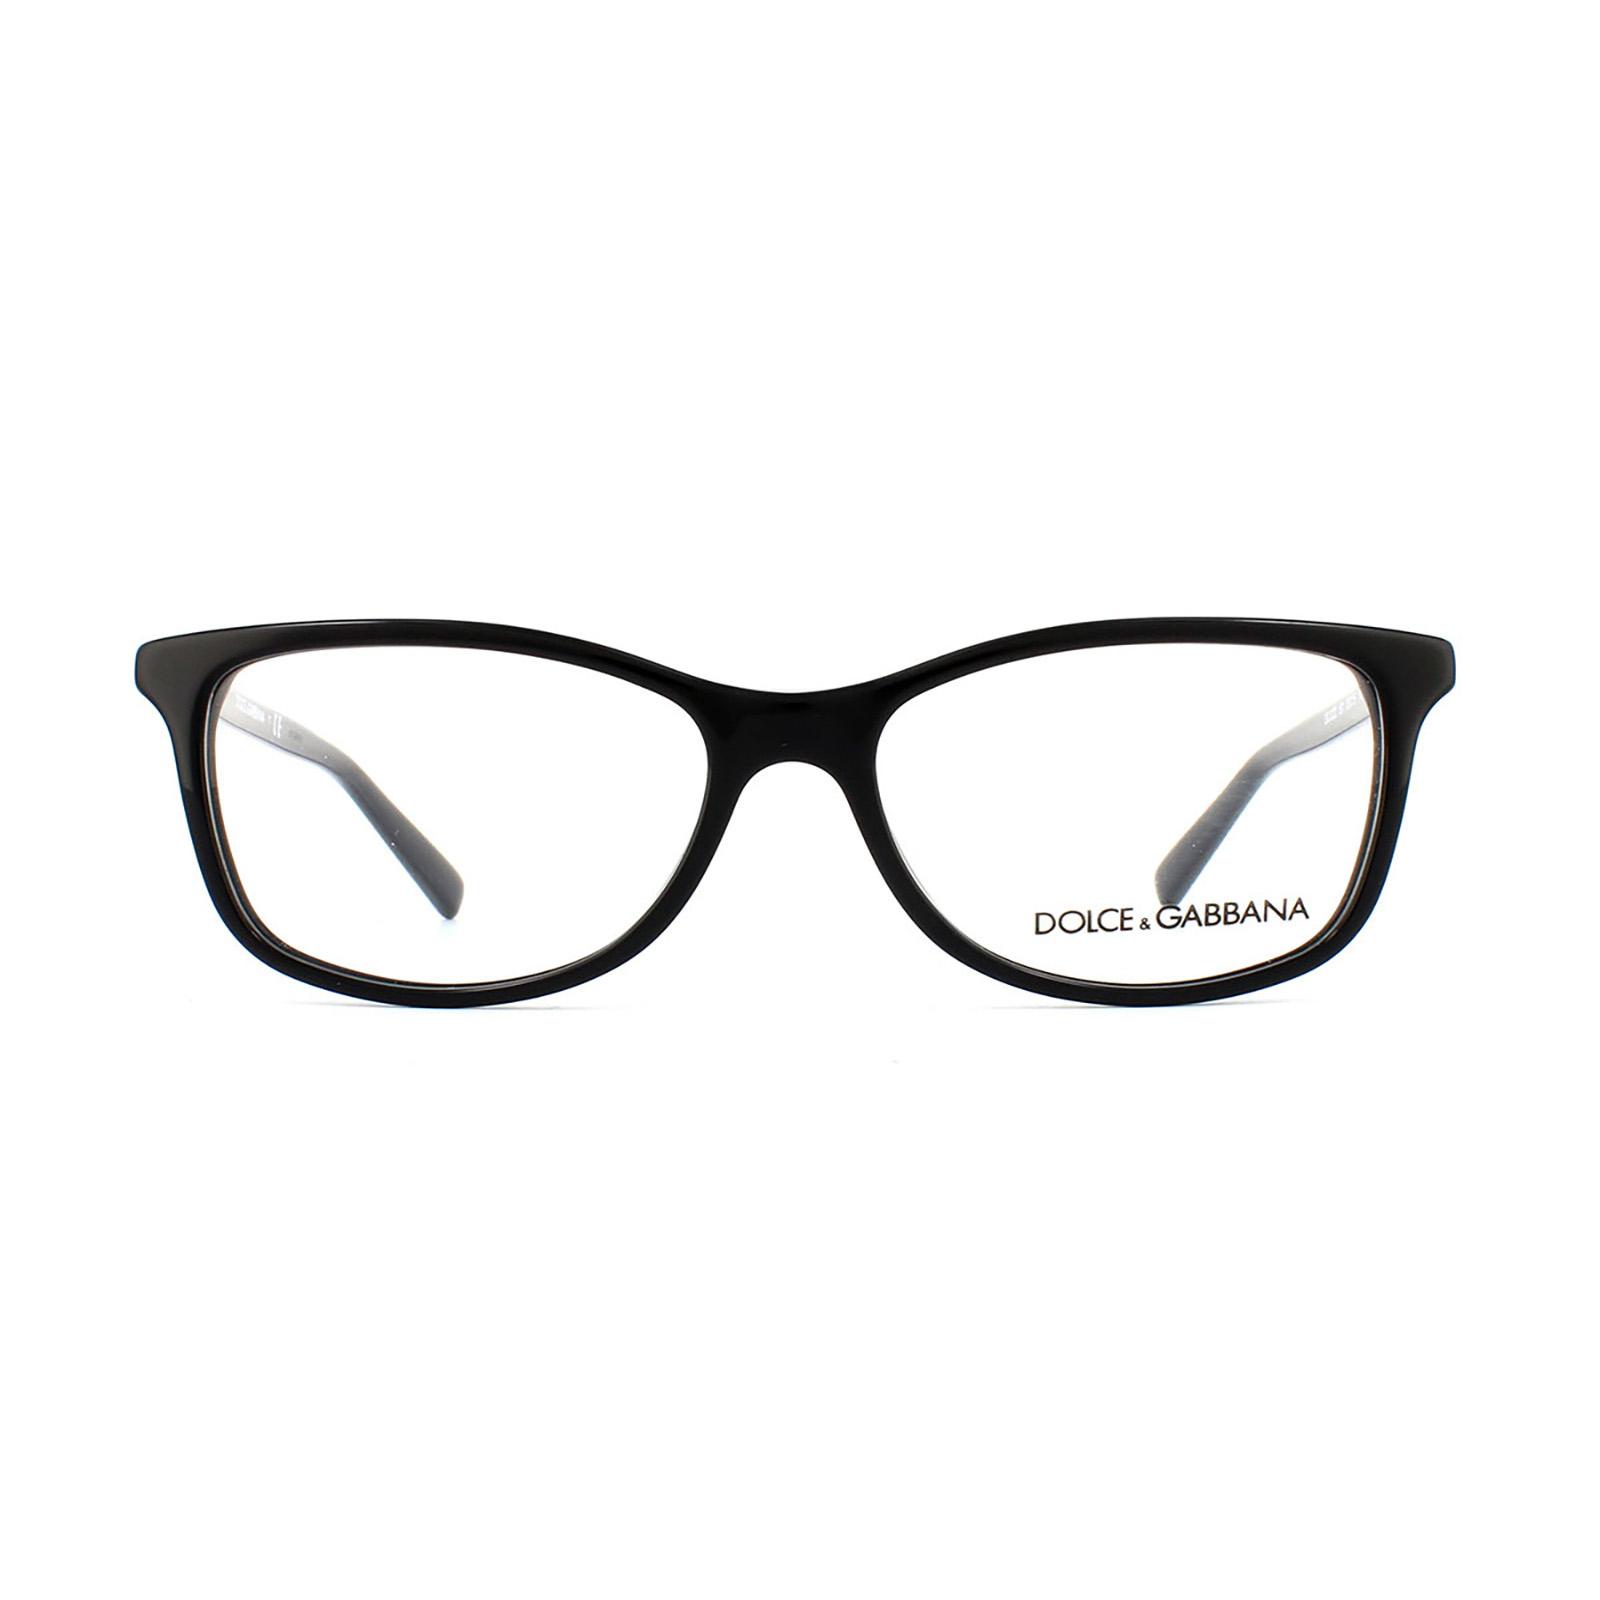 Dolce and Gabbana Glasses Frames 3222 501 Black Womens ...